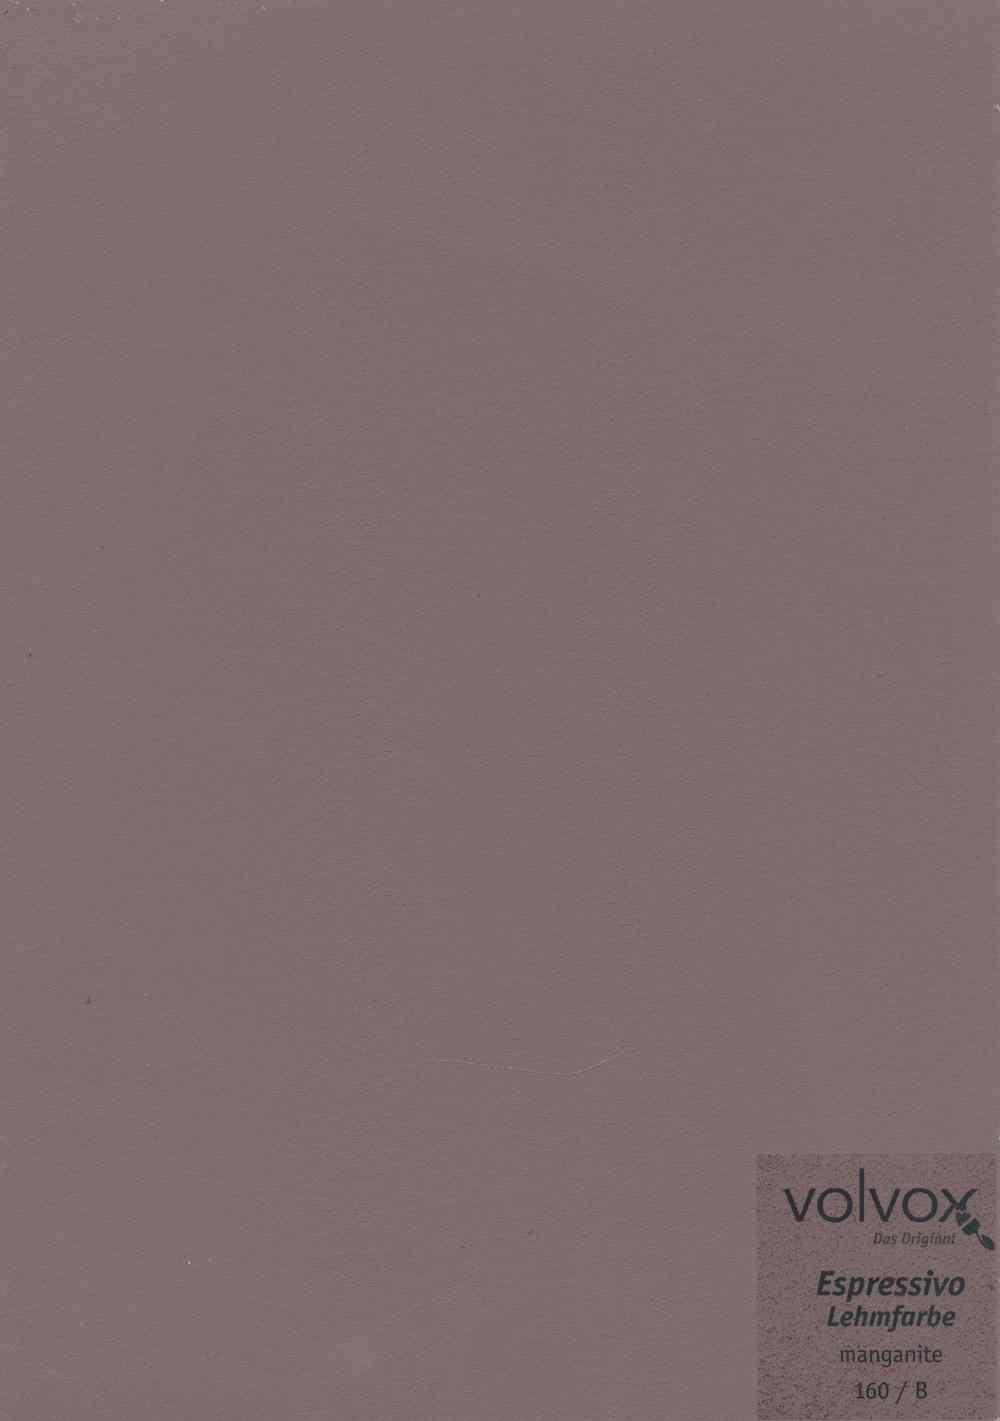 Volvox Espressivo Lehmfarbe 160 manganite